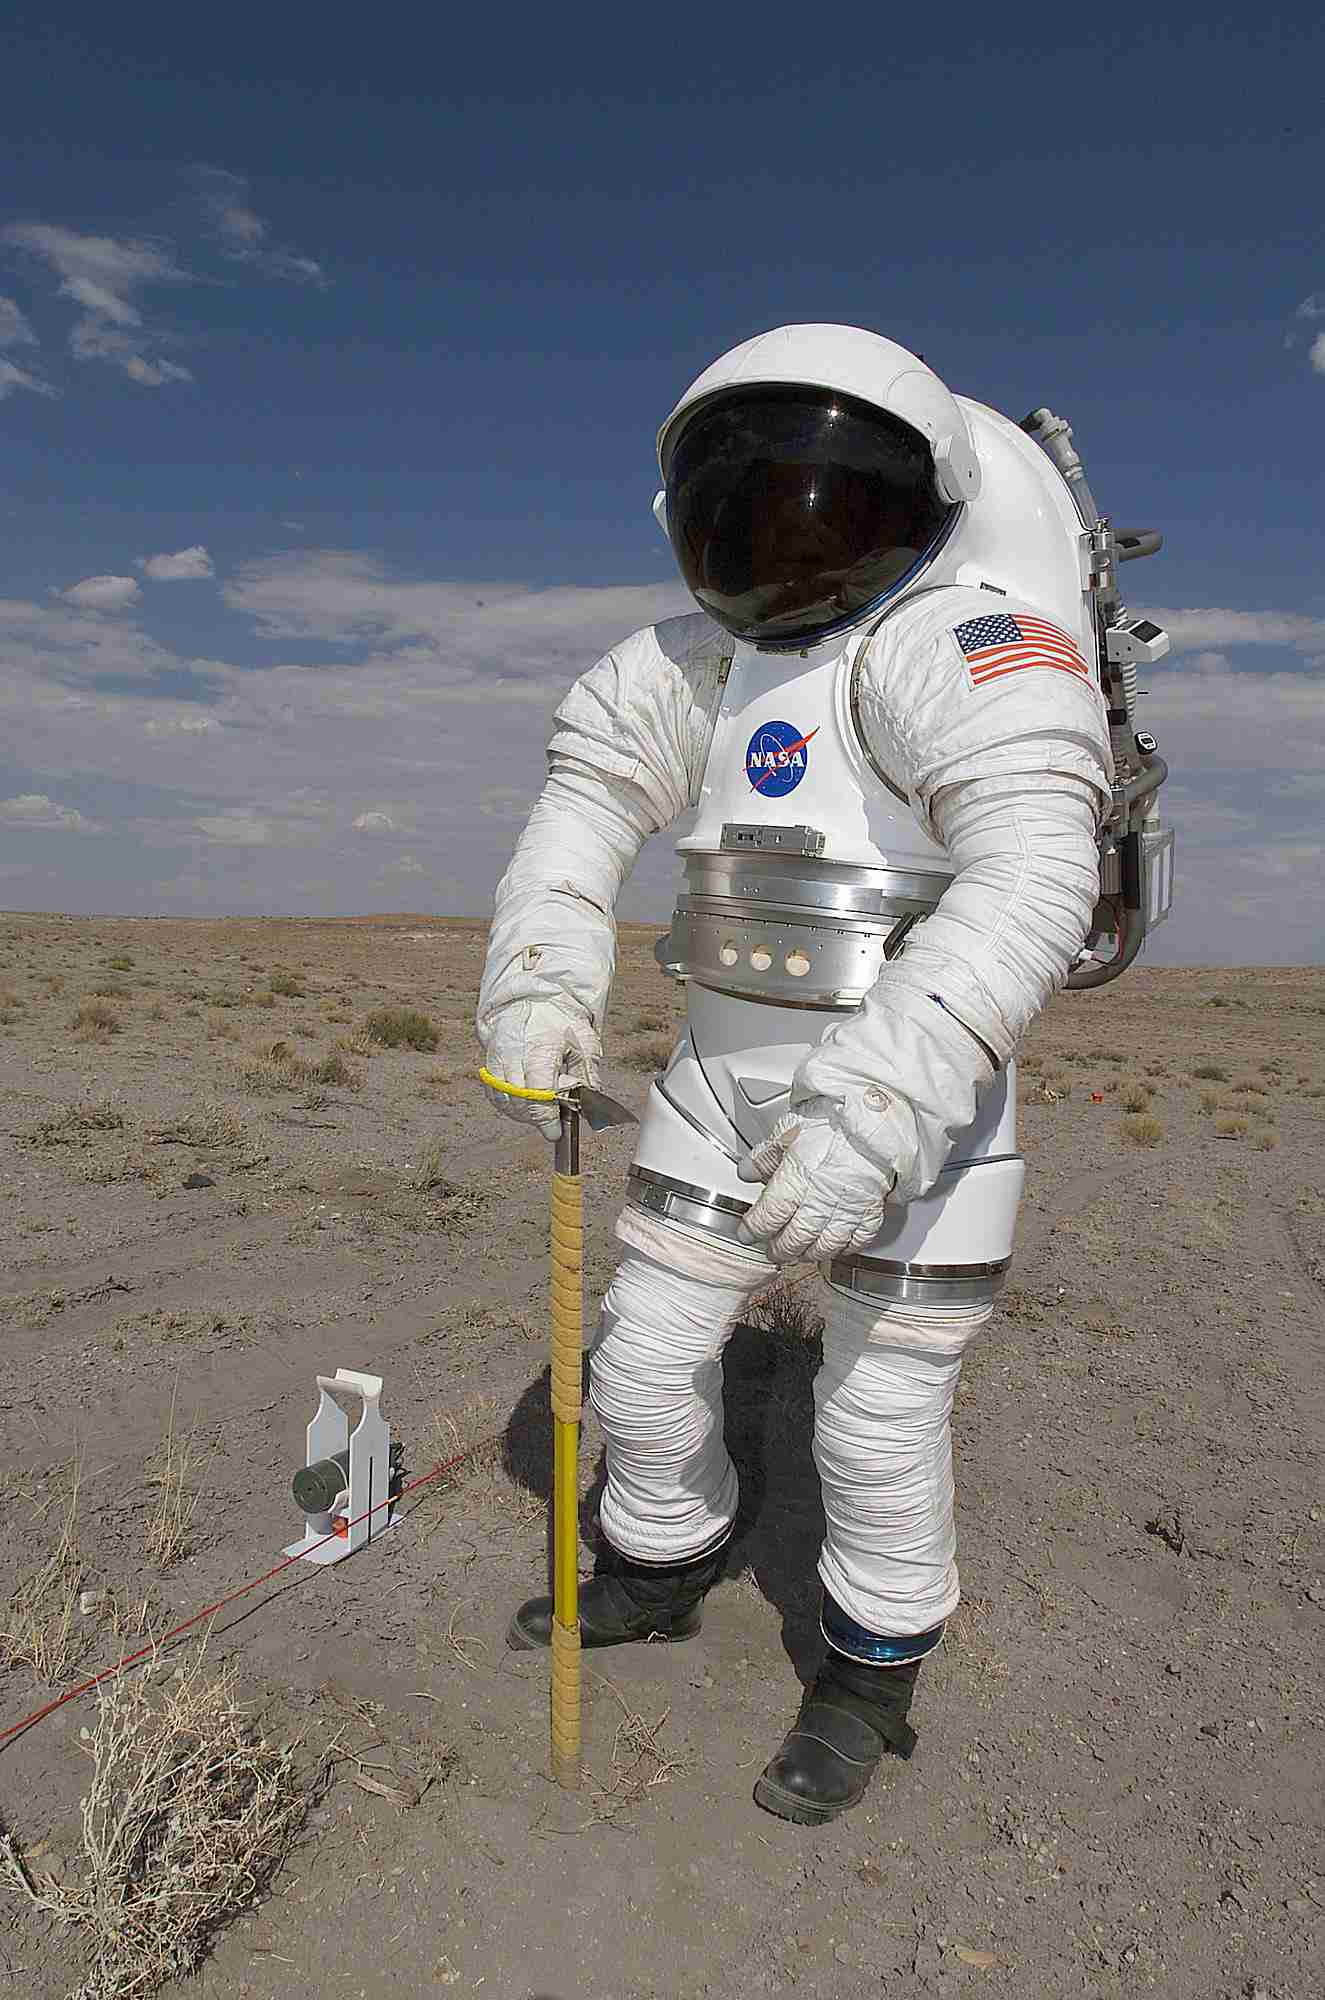 MK III Space Suit